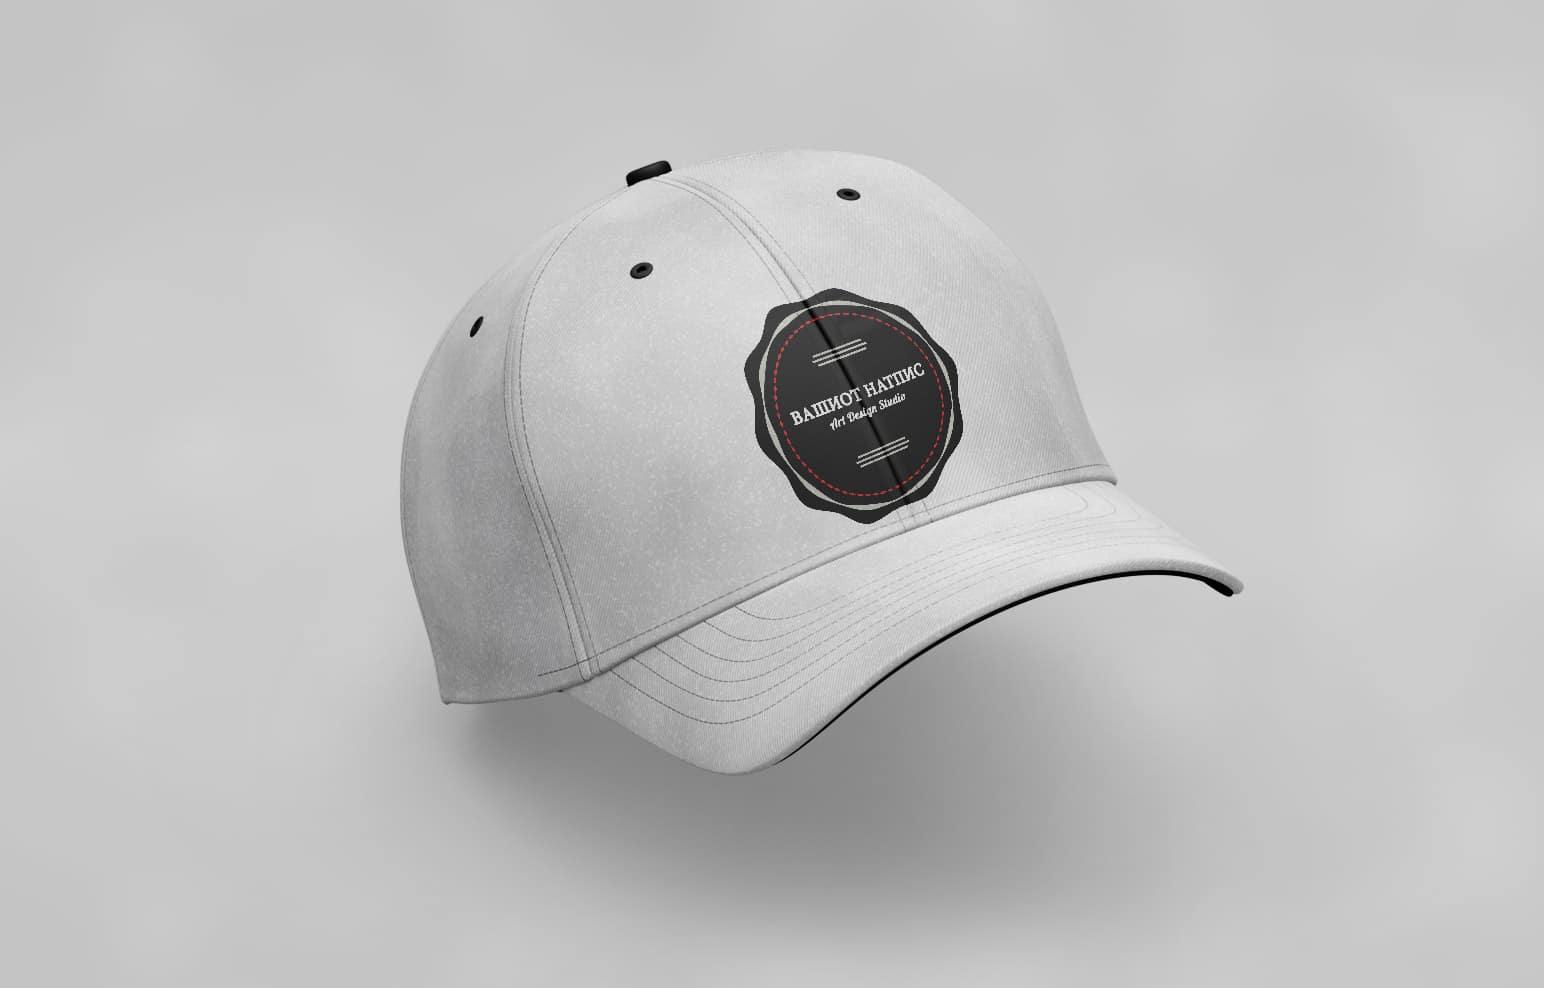 Ukrasete ja vasata kapa so dizajn celosno po vas vkus, Украсете ја вашата капа со дизајн по ваш вкус